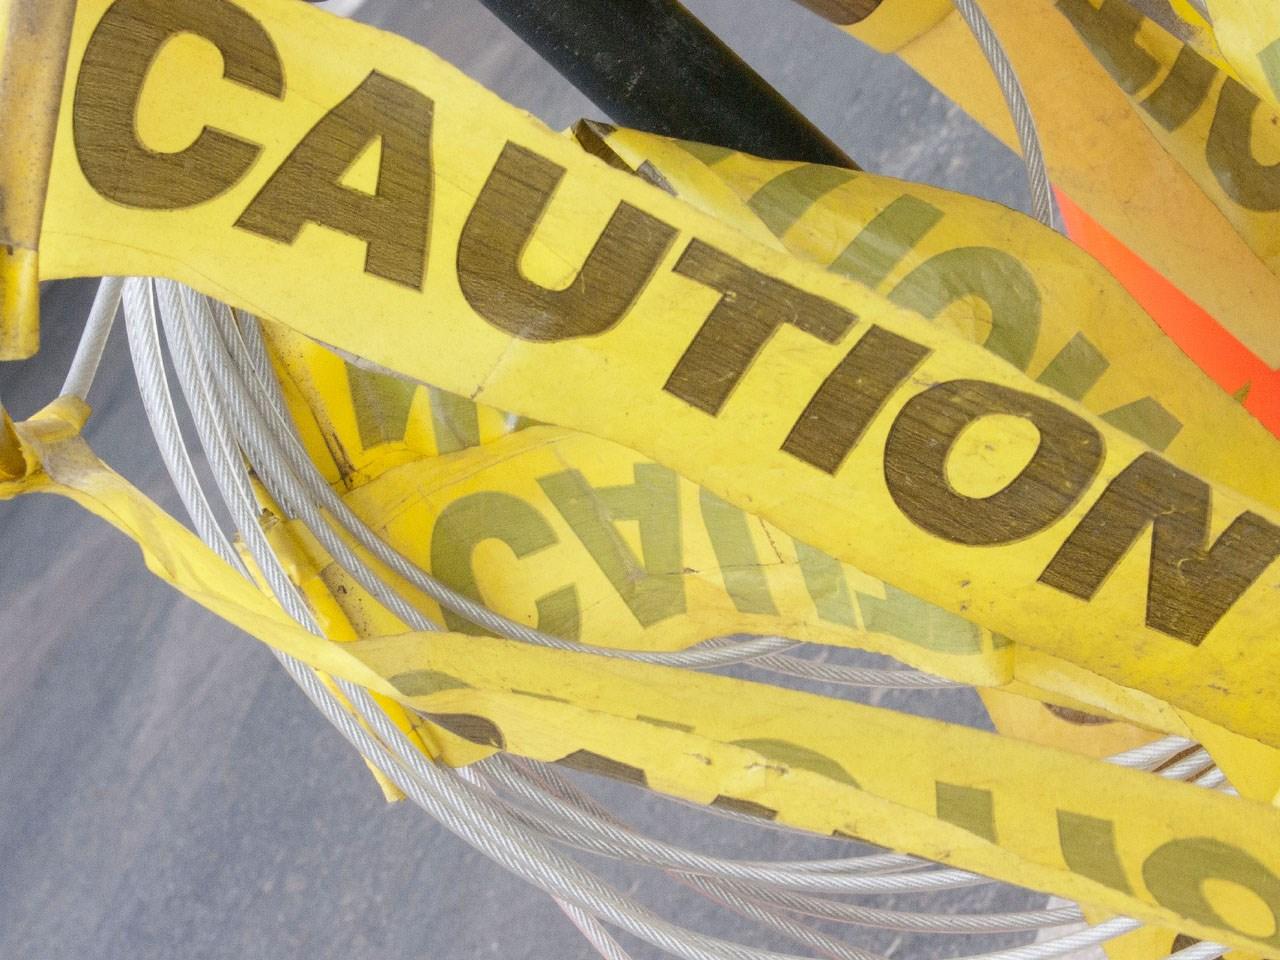 caution tape_1500555361979.jpg